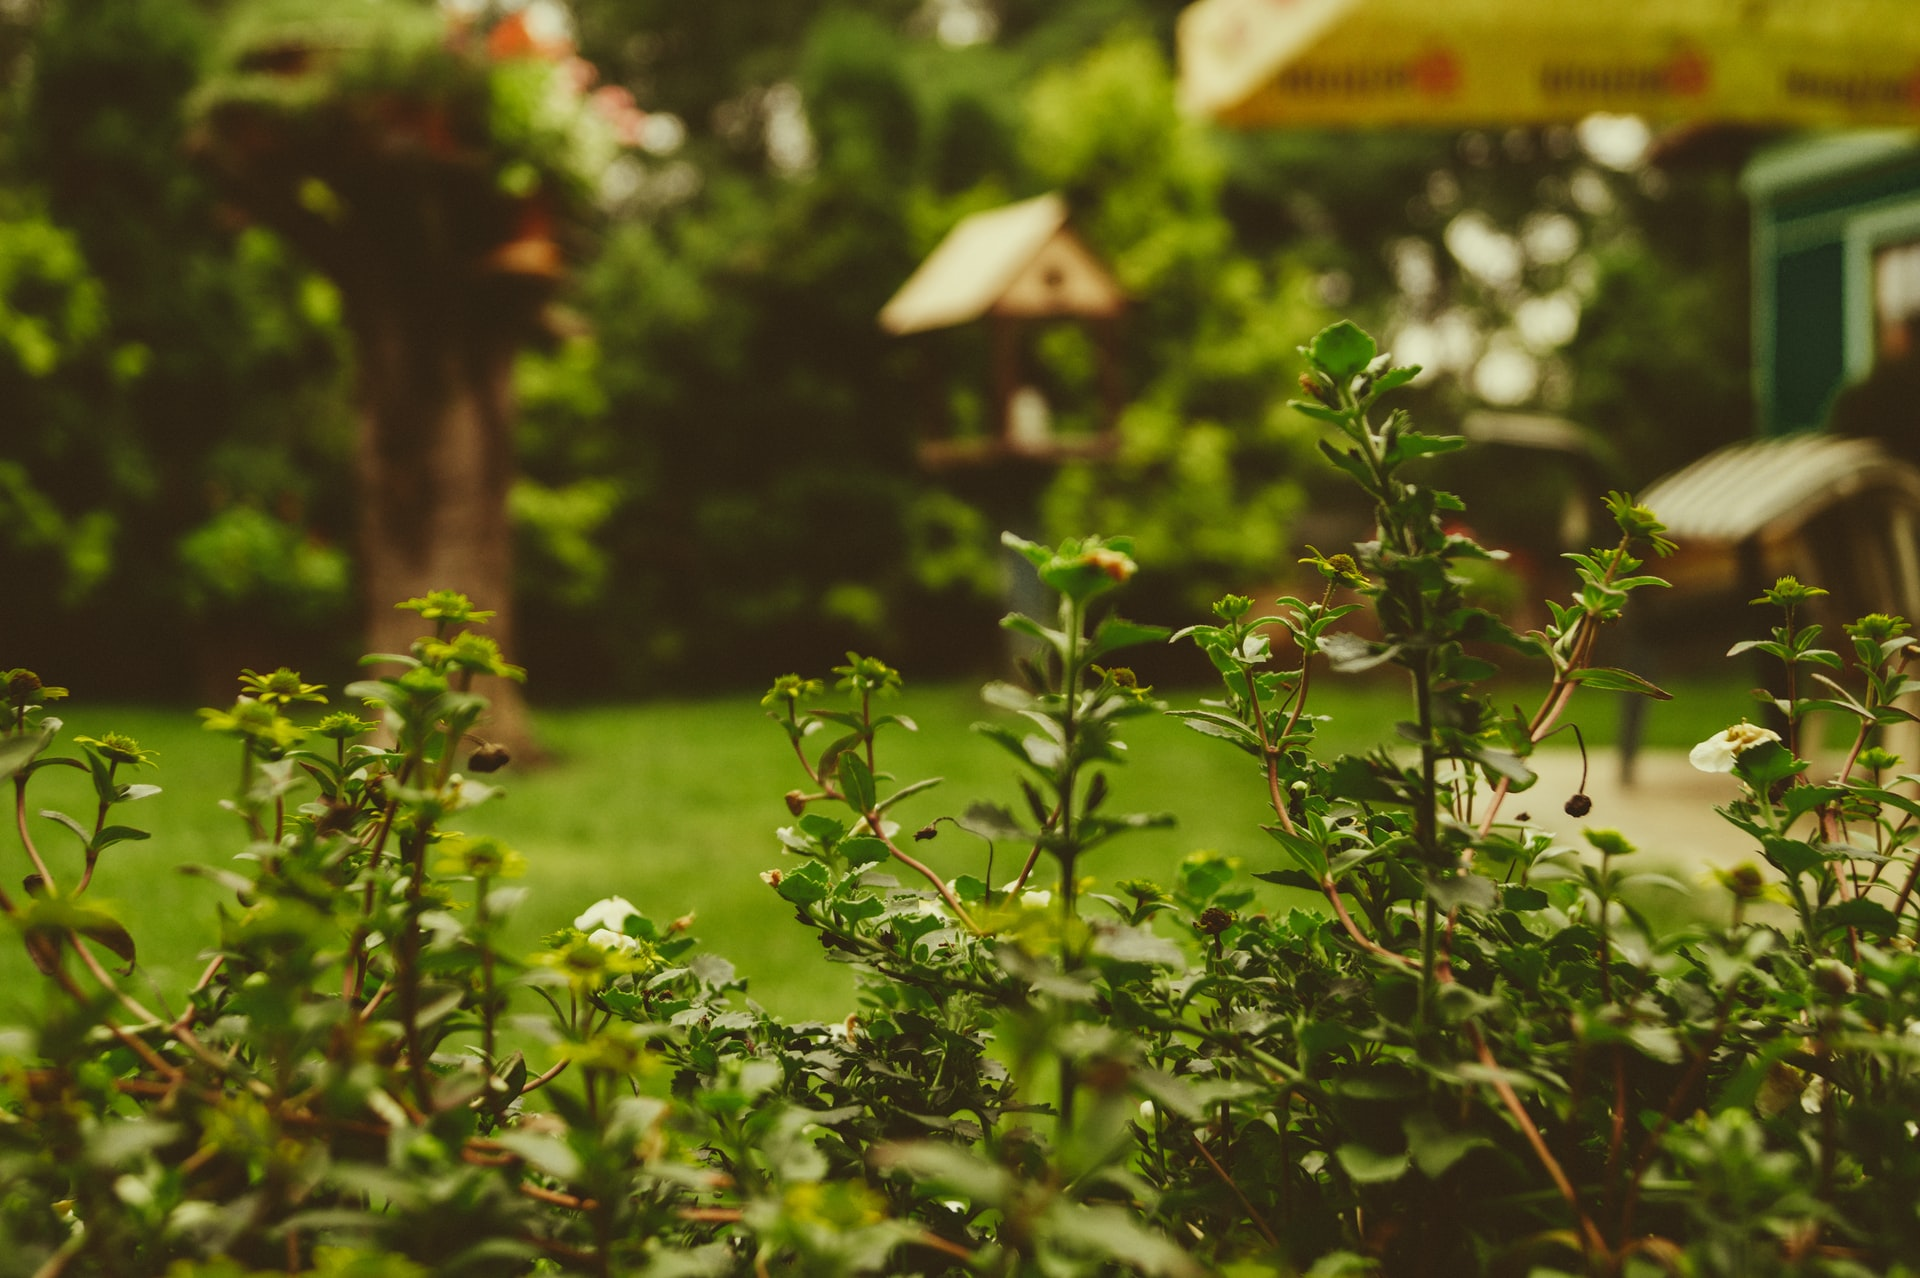 Planting Zones Explained